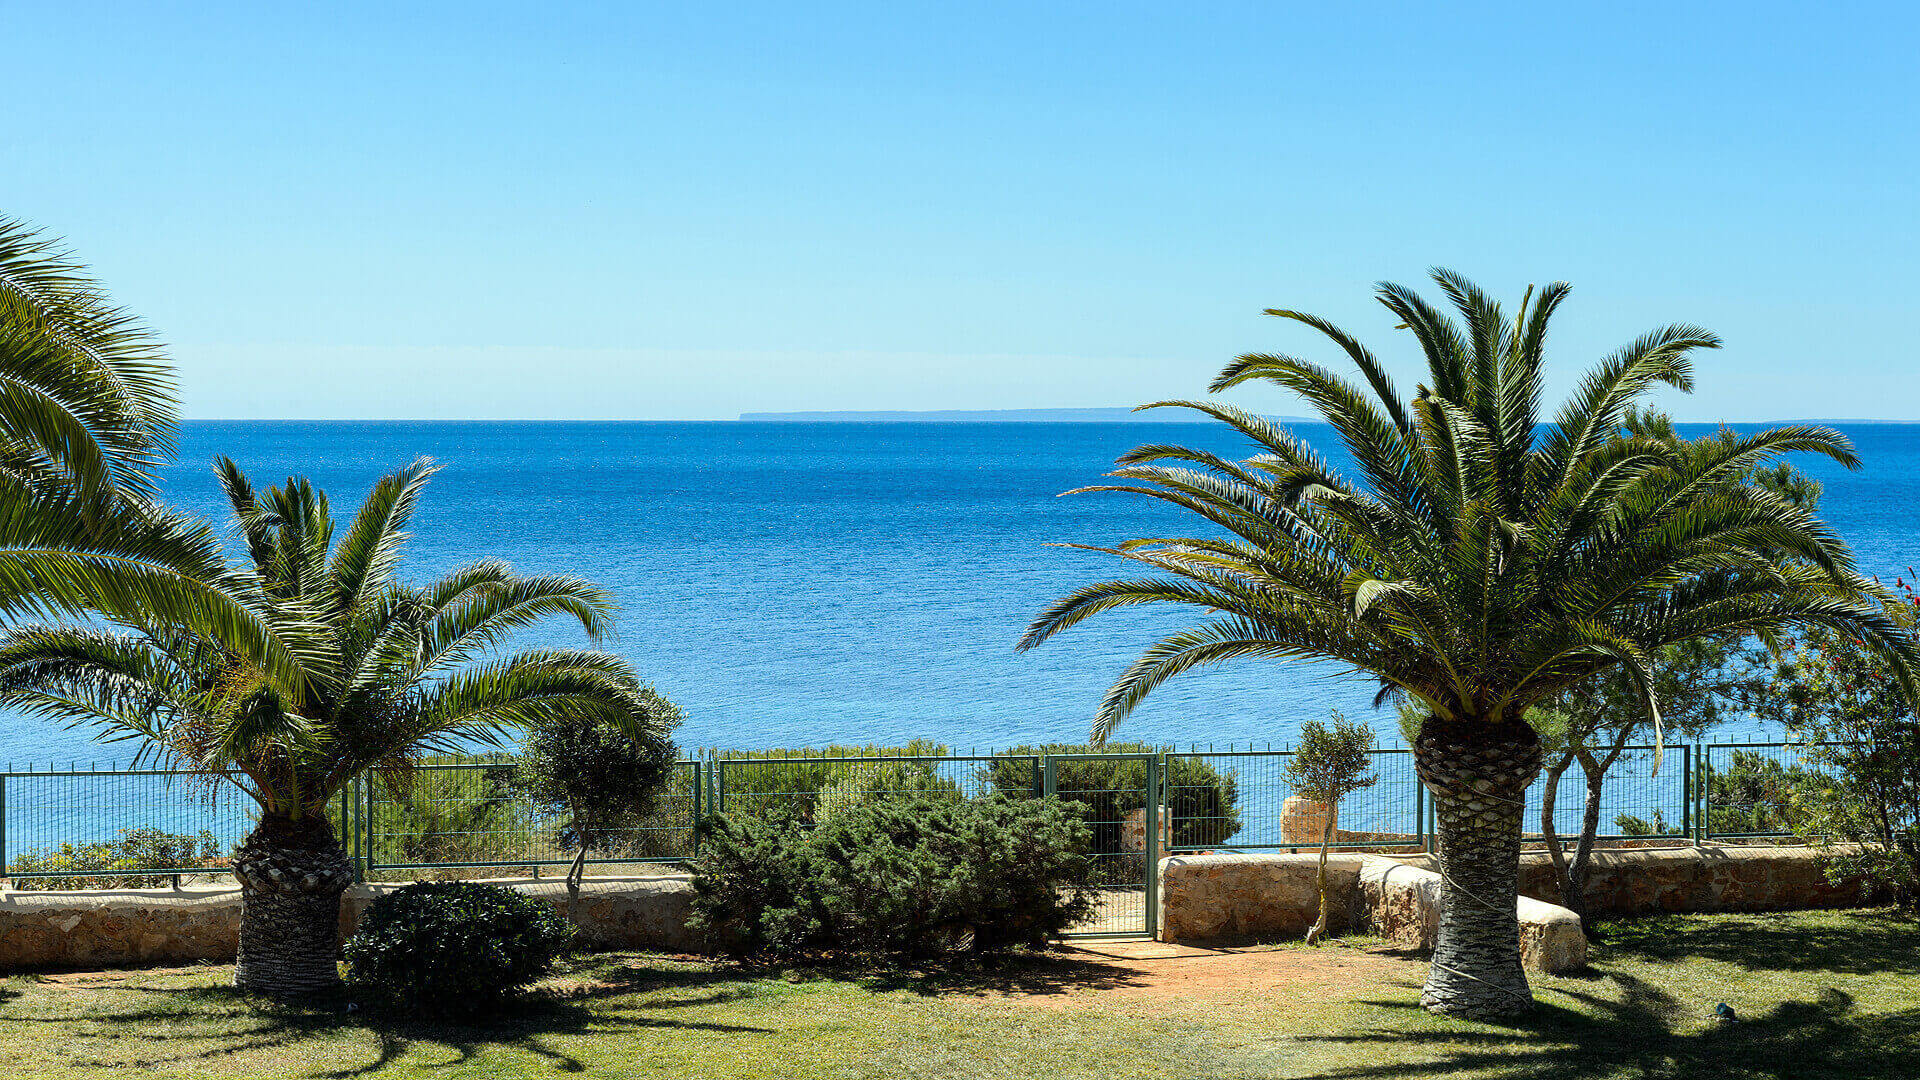 Villa Cigala Ibiza 3 Santa Eulalia